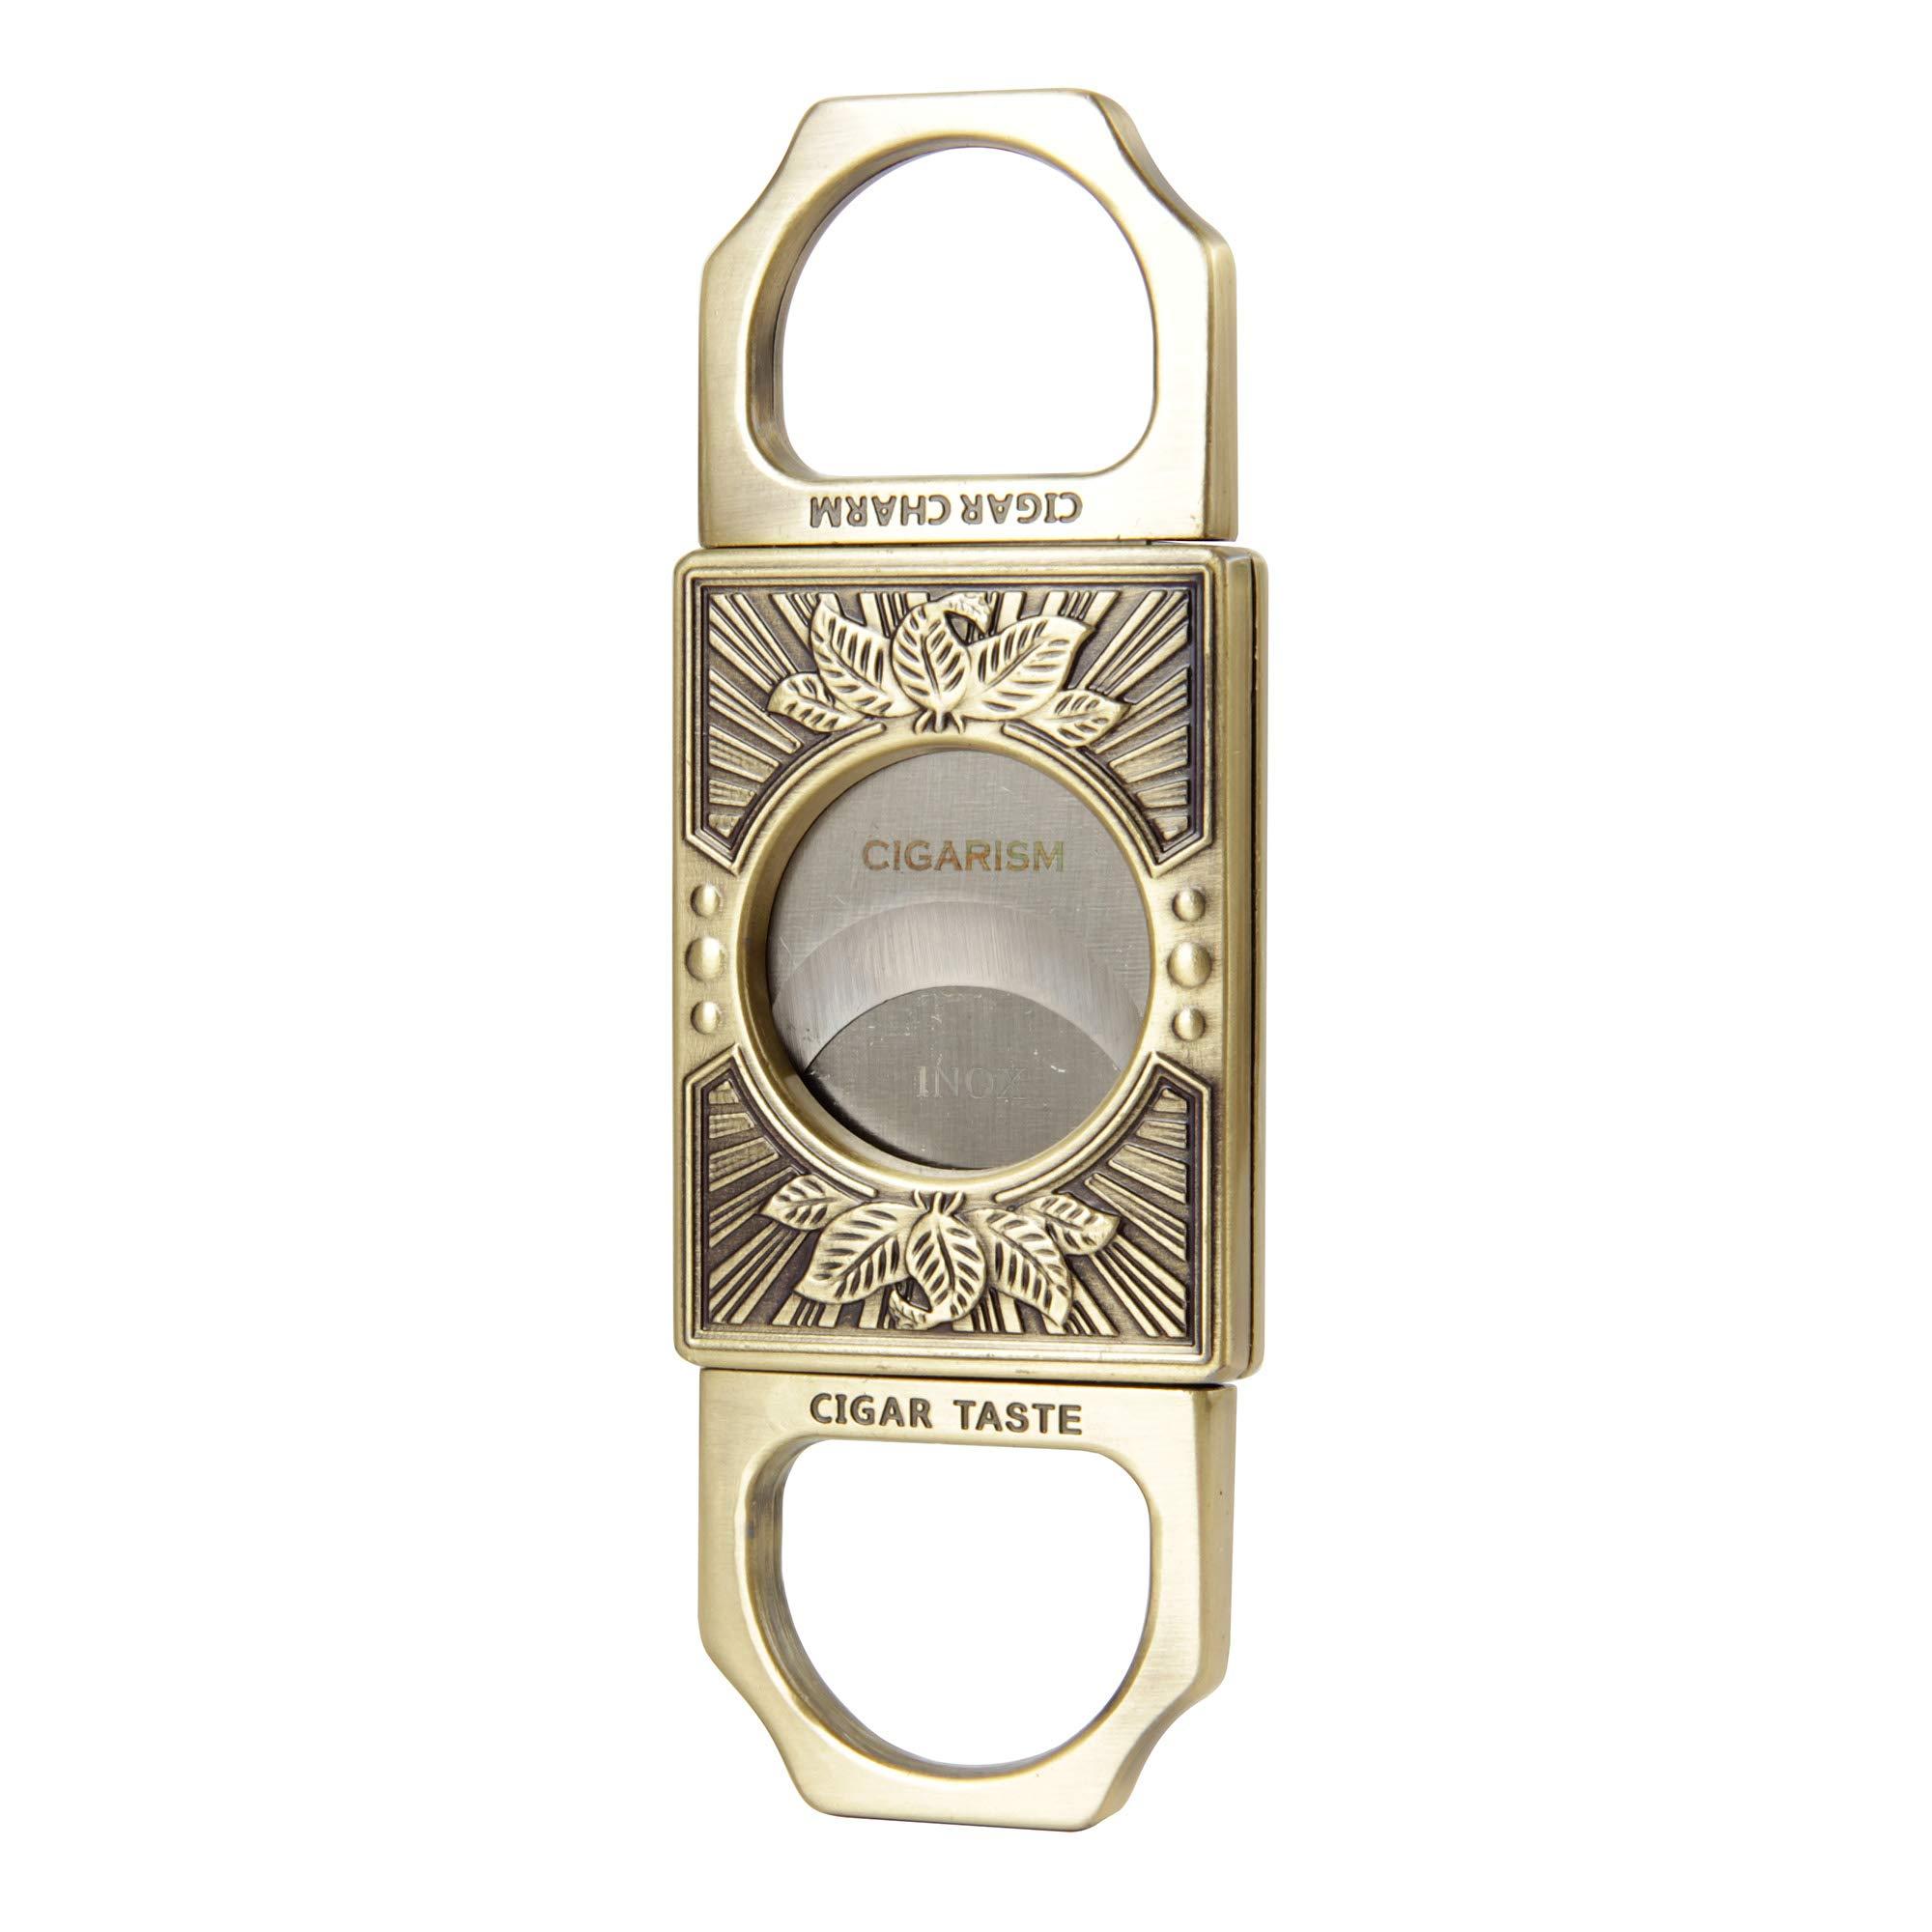 CIGARISM Leaves Engraving Zinc Alloy Cigar Cutter (Vintage Brass)